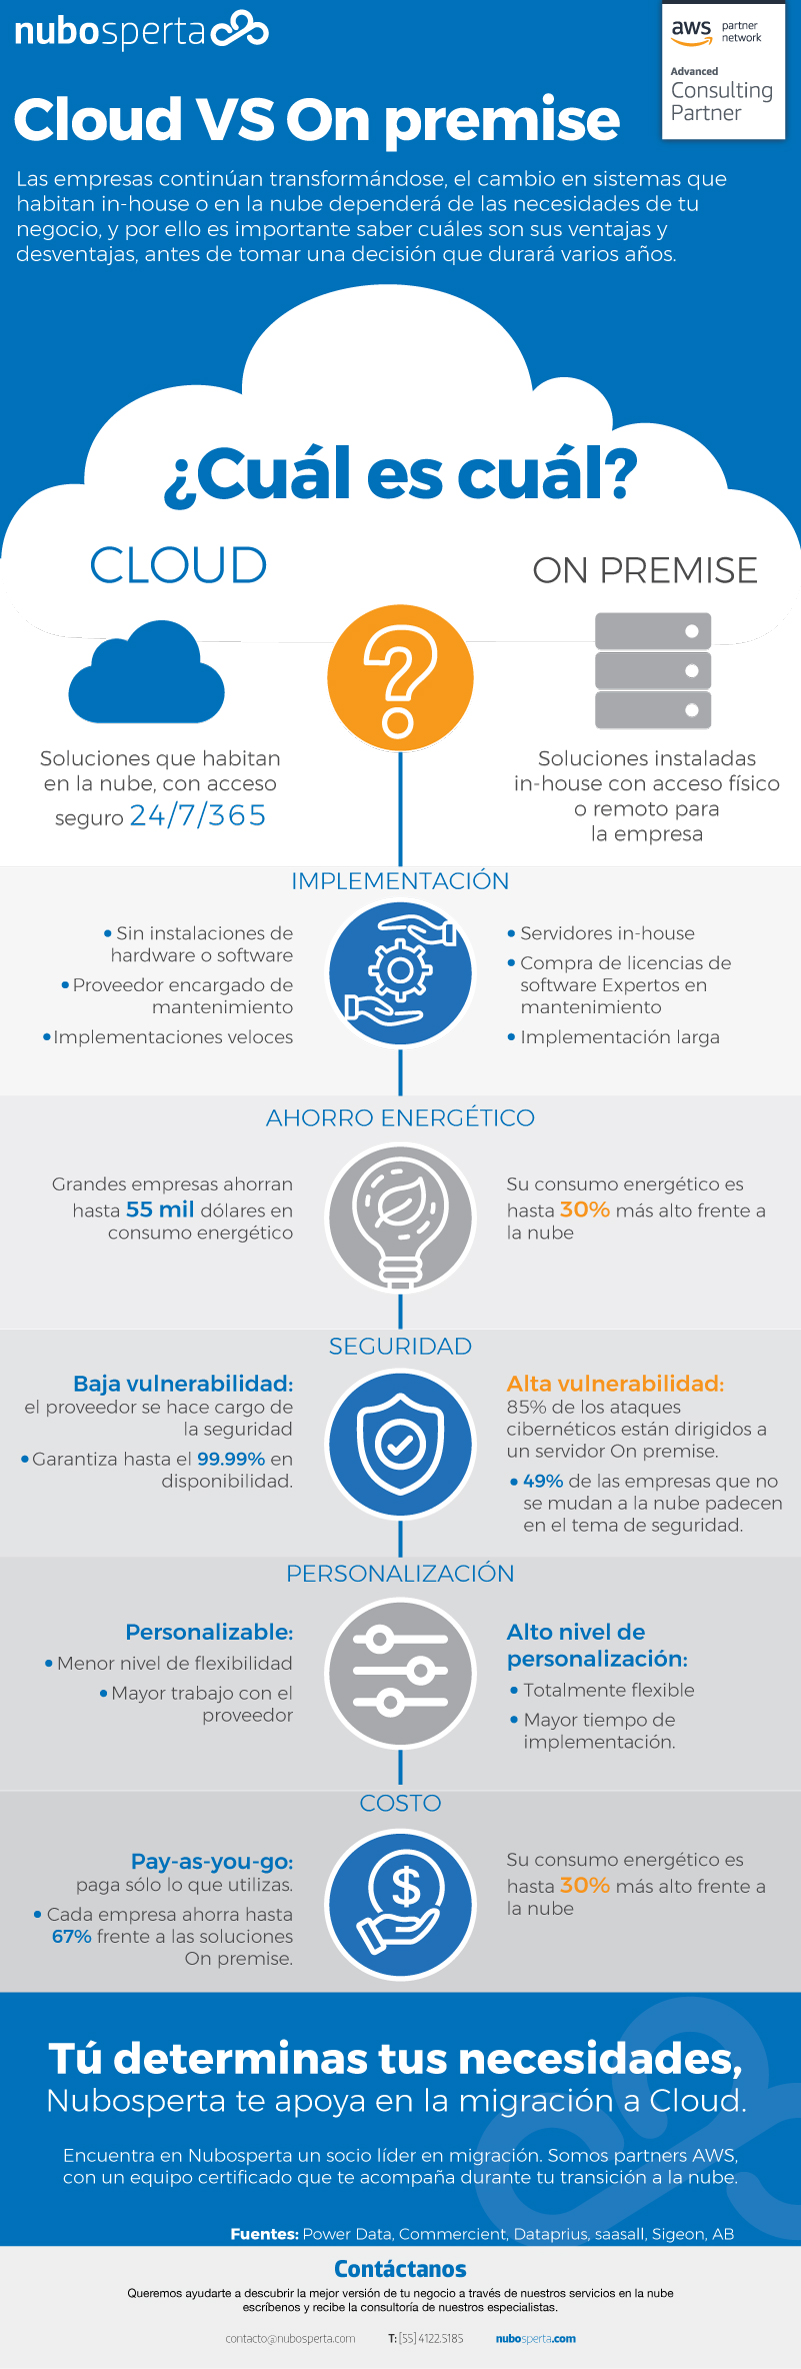 Nubo-info-migracion-1